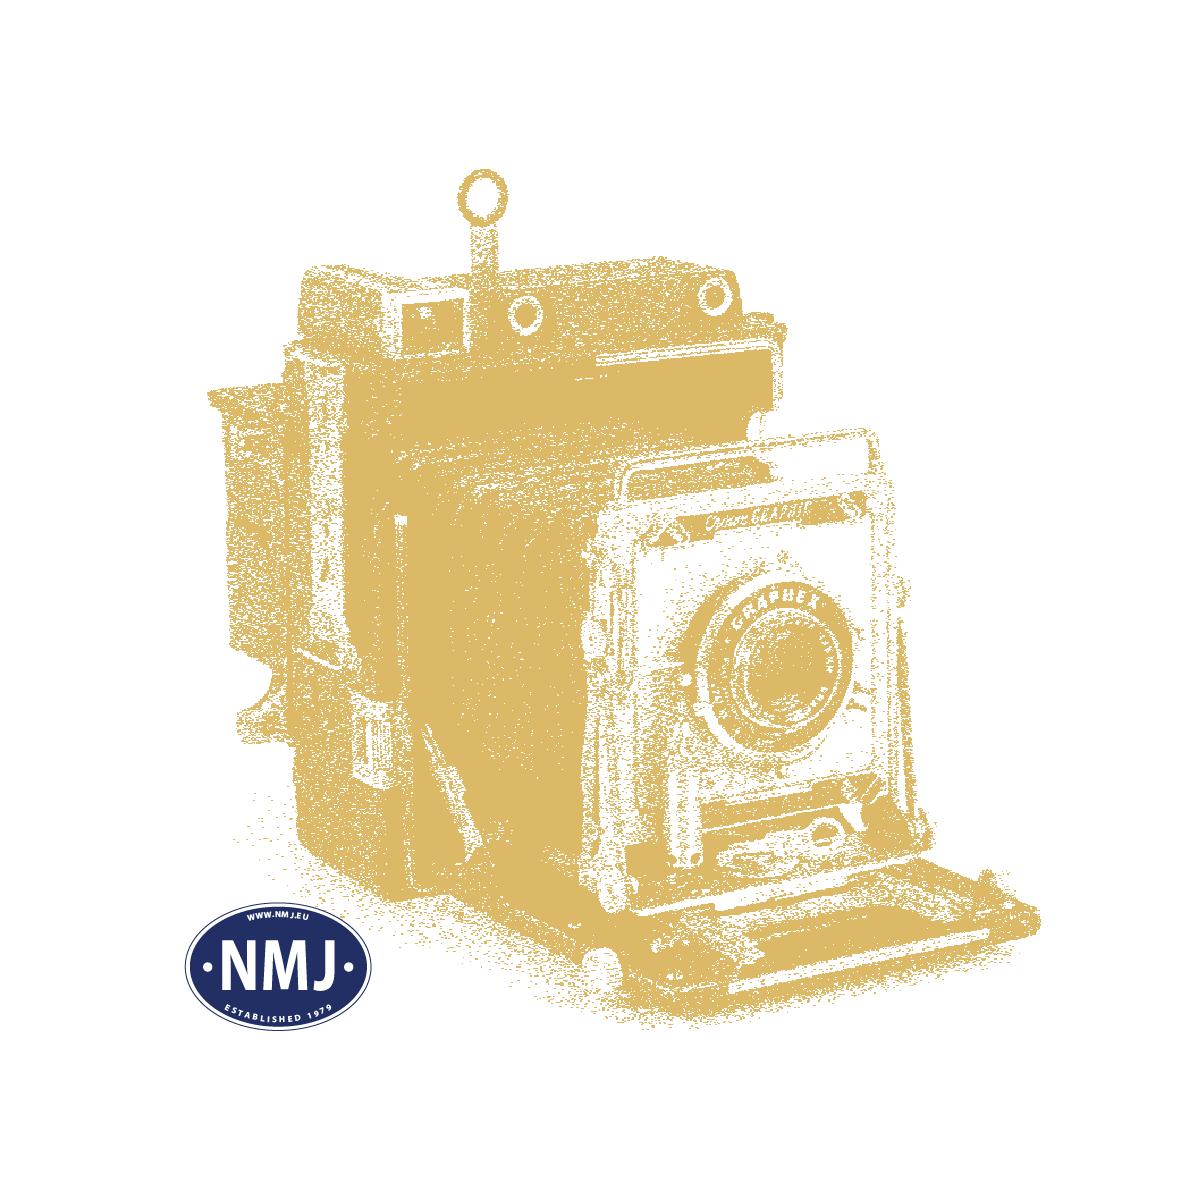 MBR55-1008 - Gressmatte #8, 30 x 40 Cm